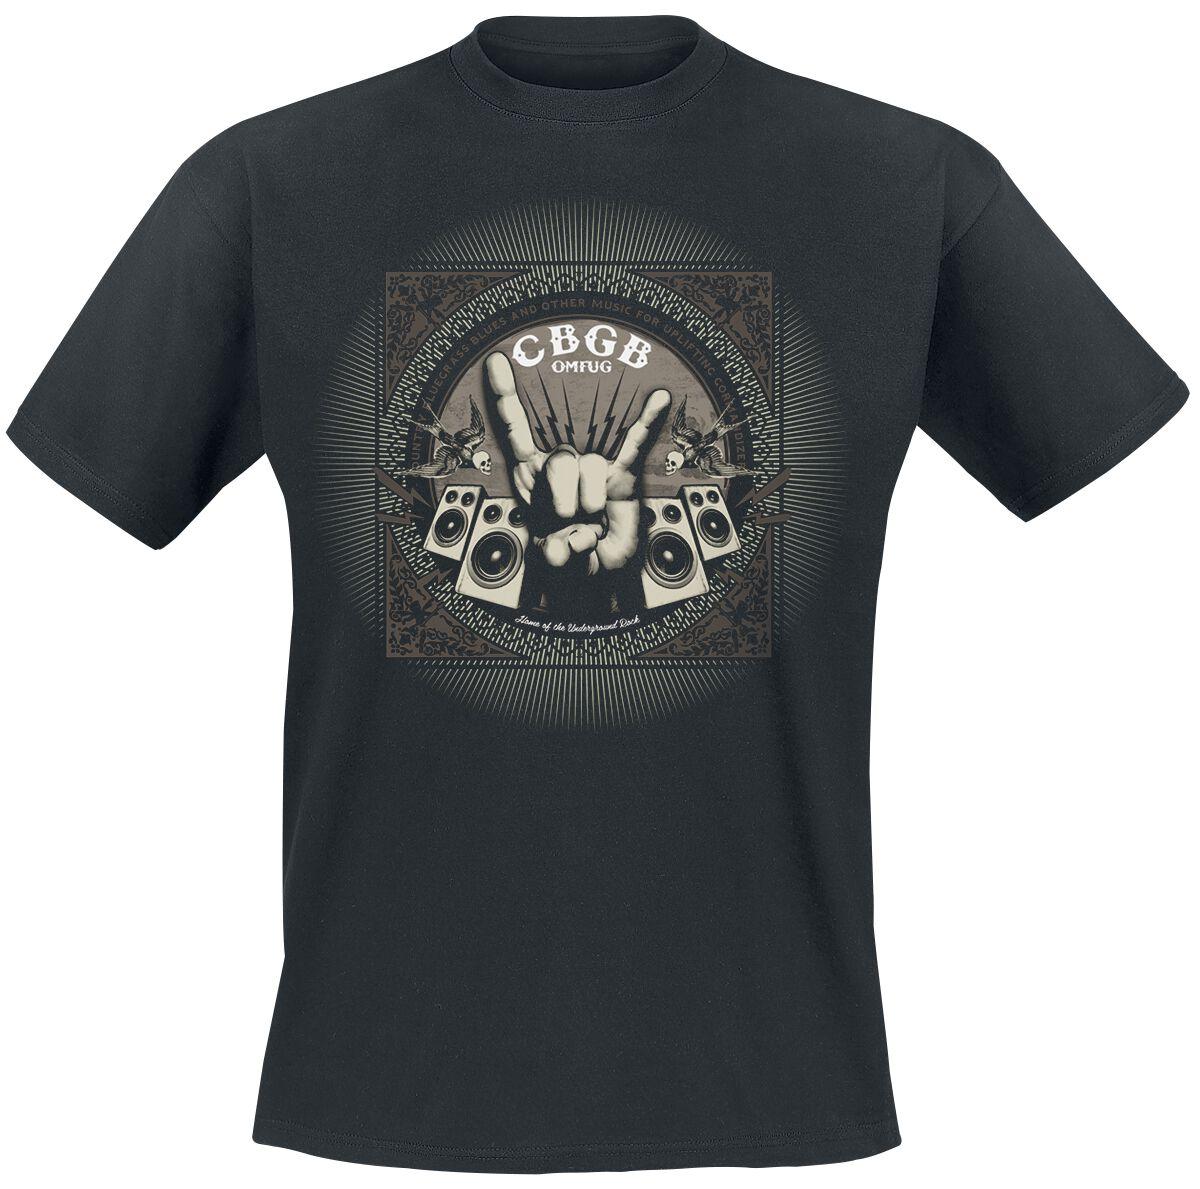 Merch dla Fanów - Koszulki - T-Shirt CBGB Rock Hand T-Shirt czarny - 347903